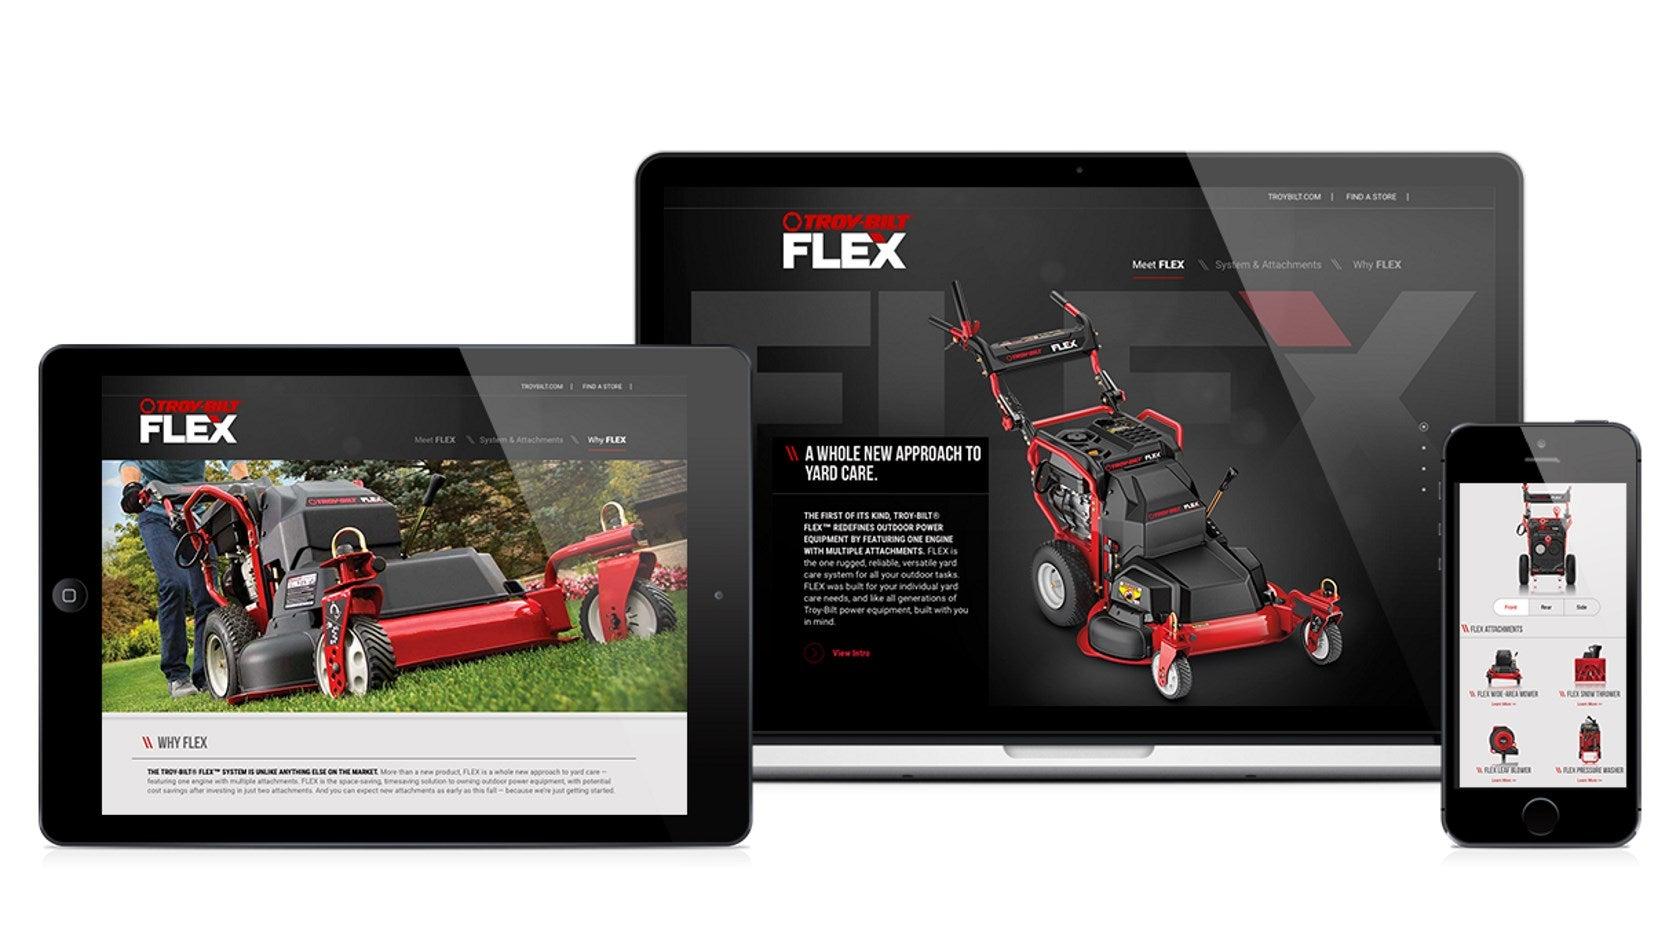 TB-FLEX_Website_1680x936.jpg